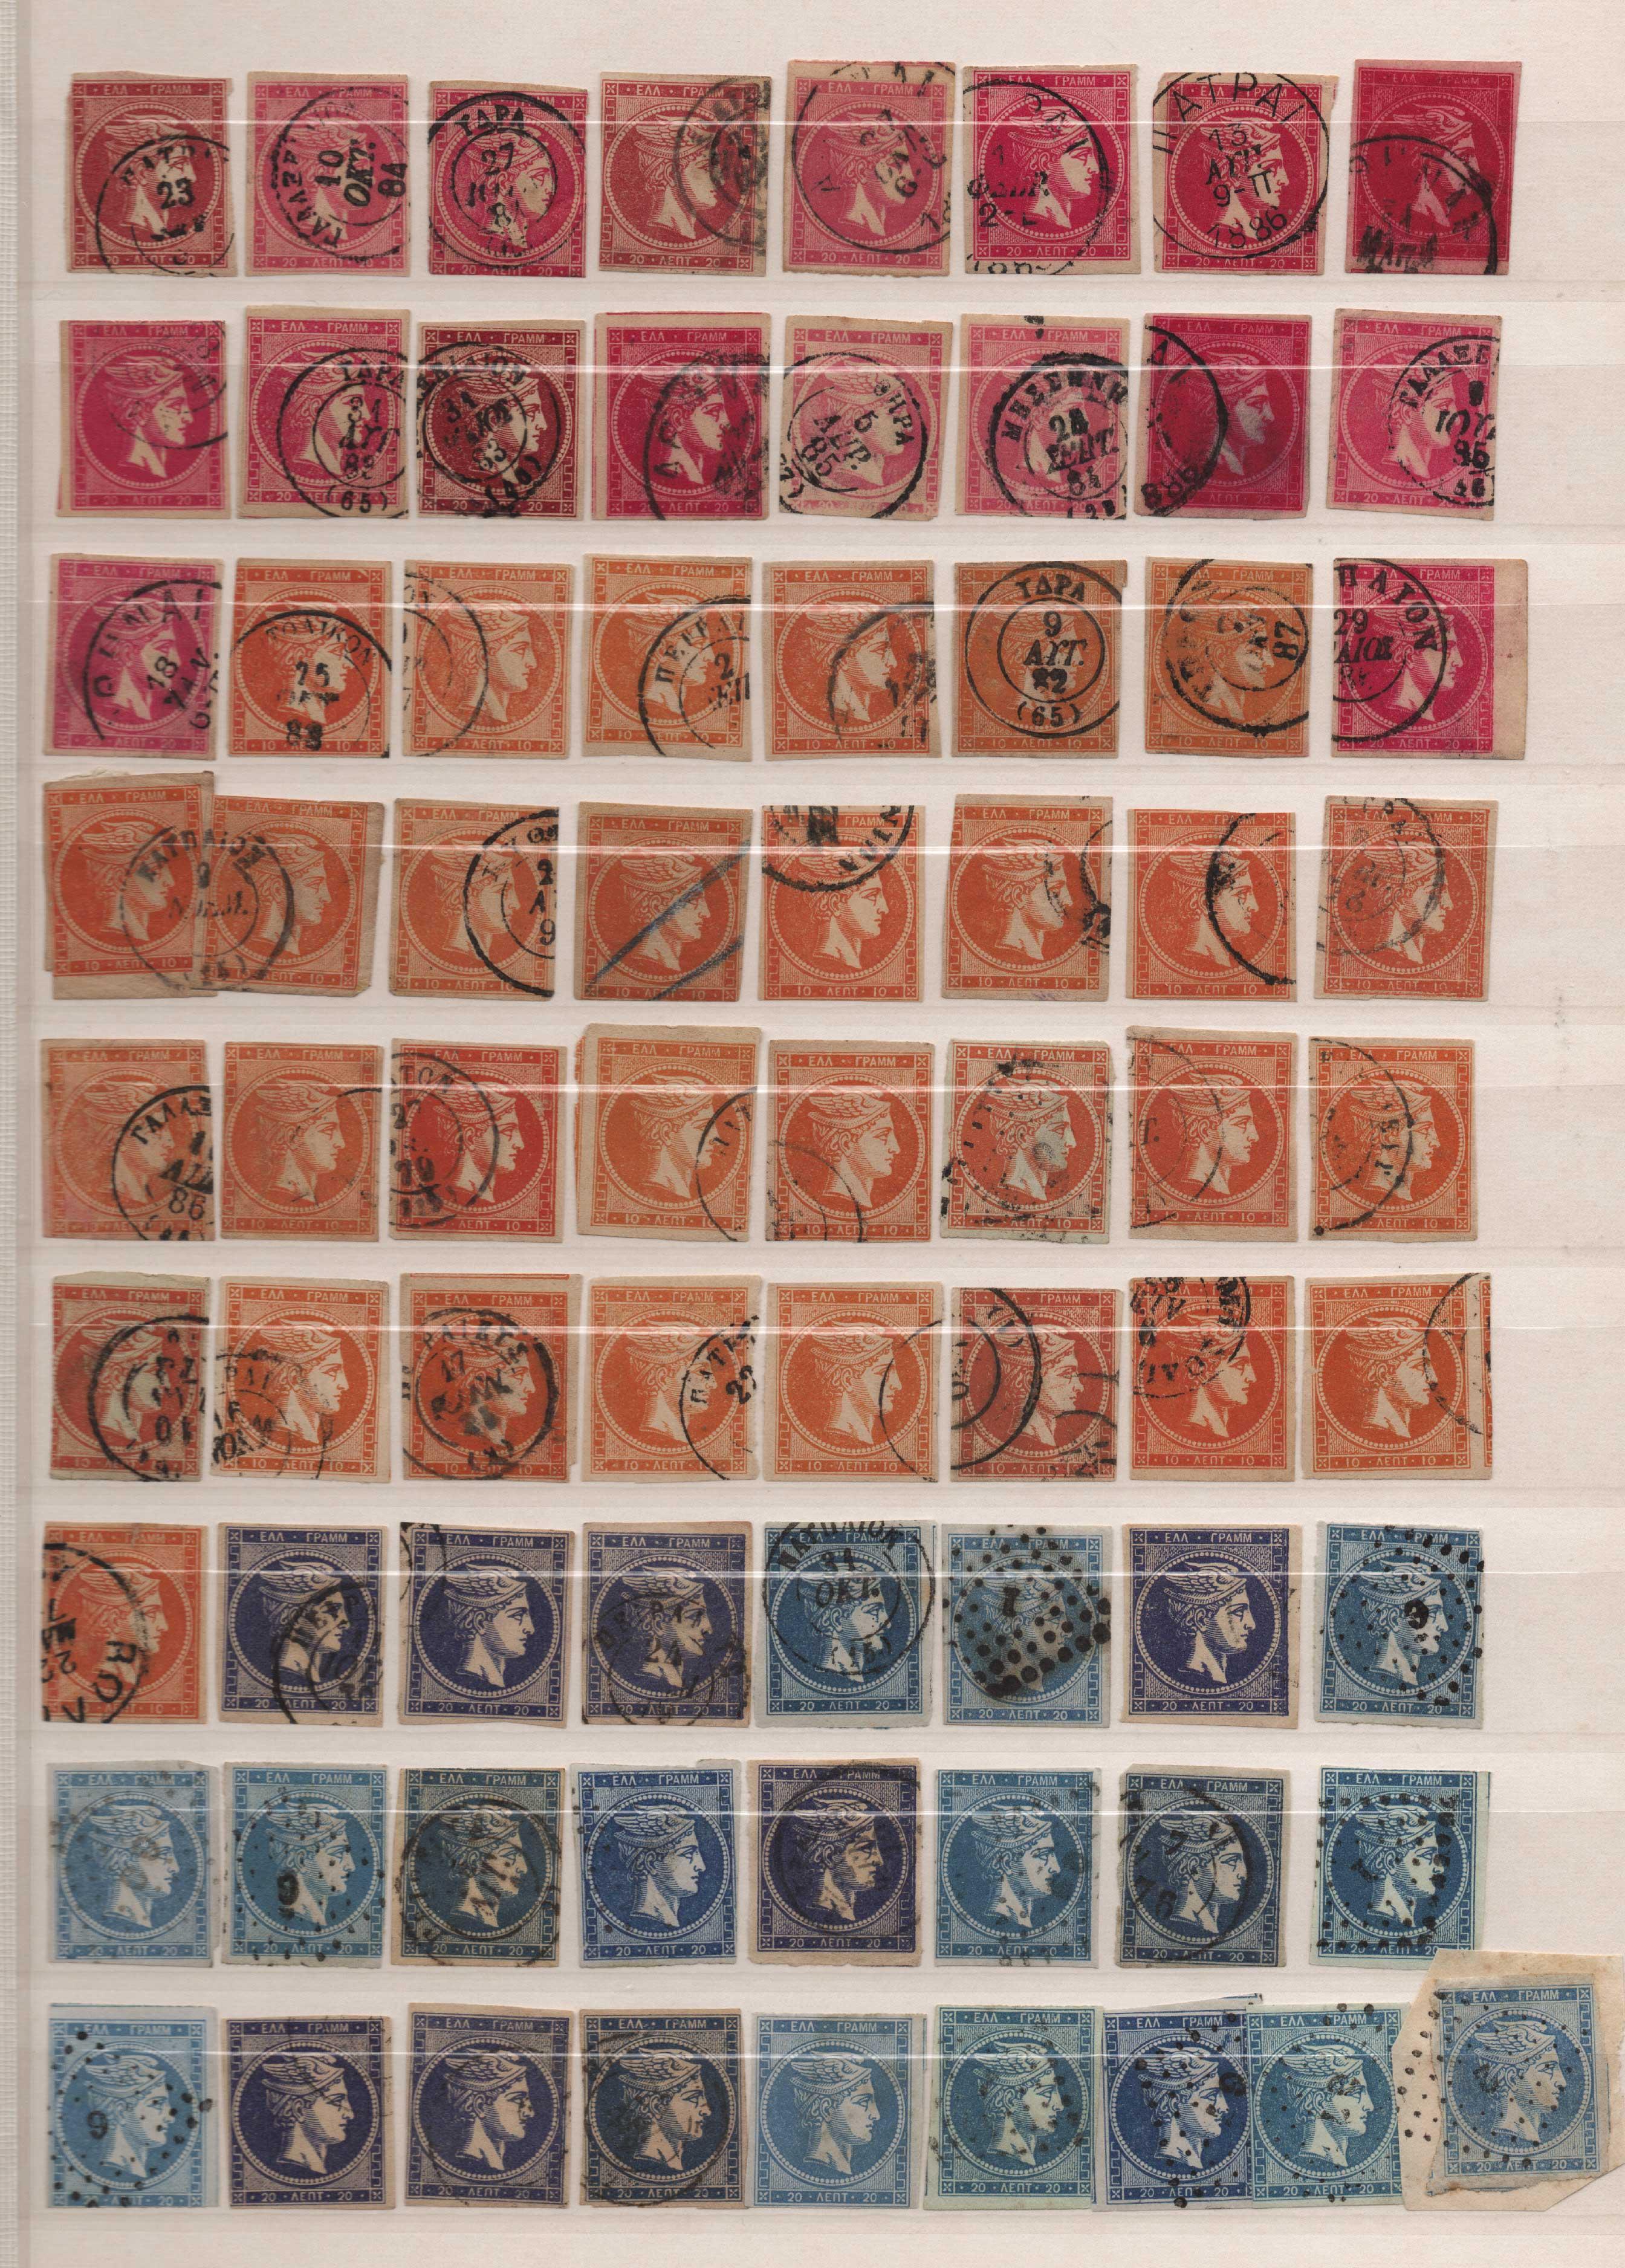 Lot 35 - -  LARGE HERMES HEAD large hermes head -  Athens Auctions Public Auction 89 General Stamp Sale